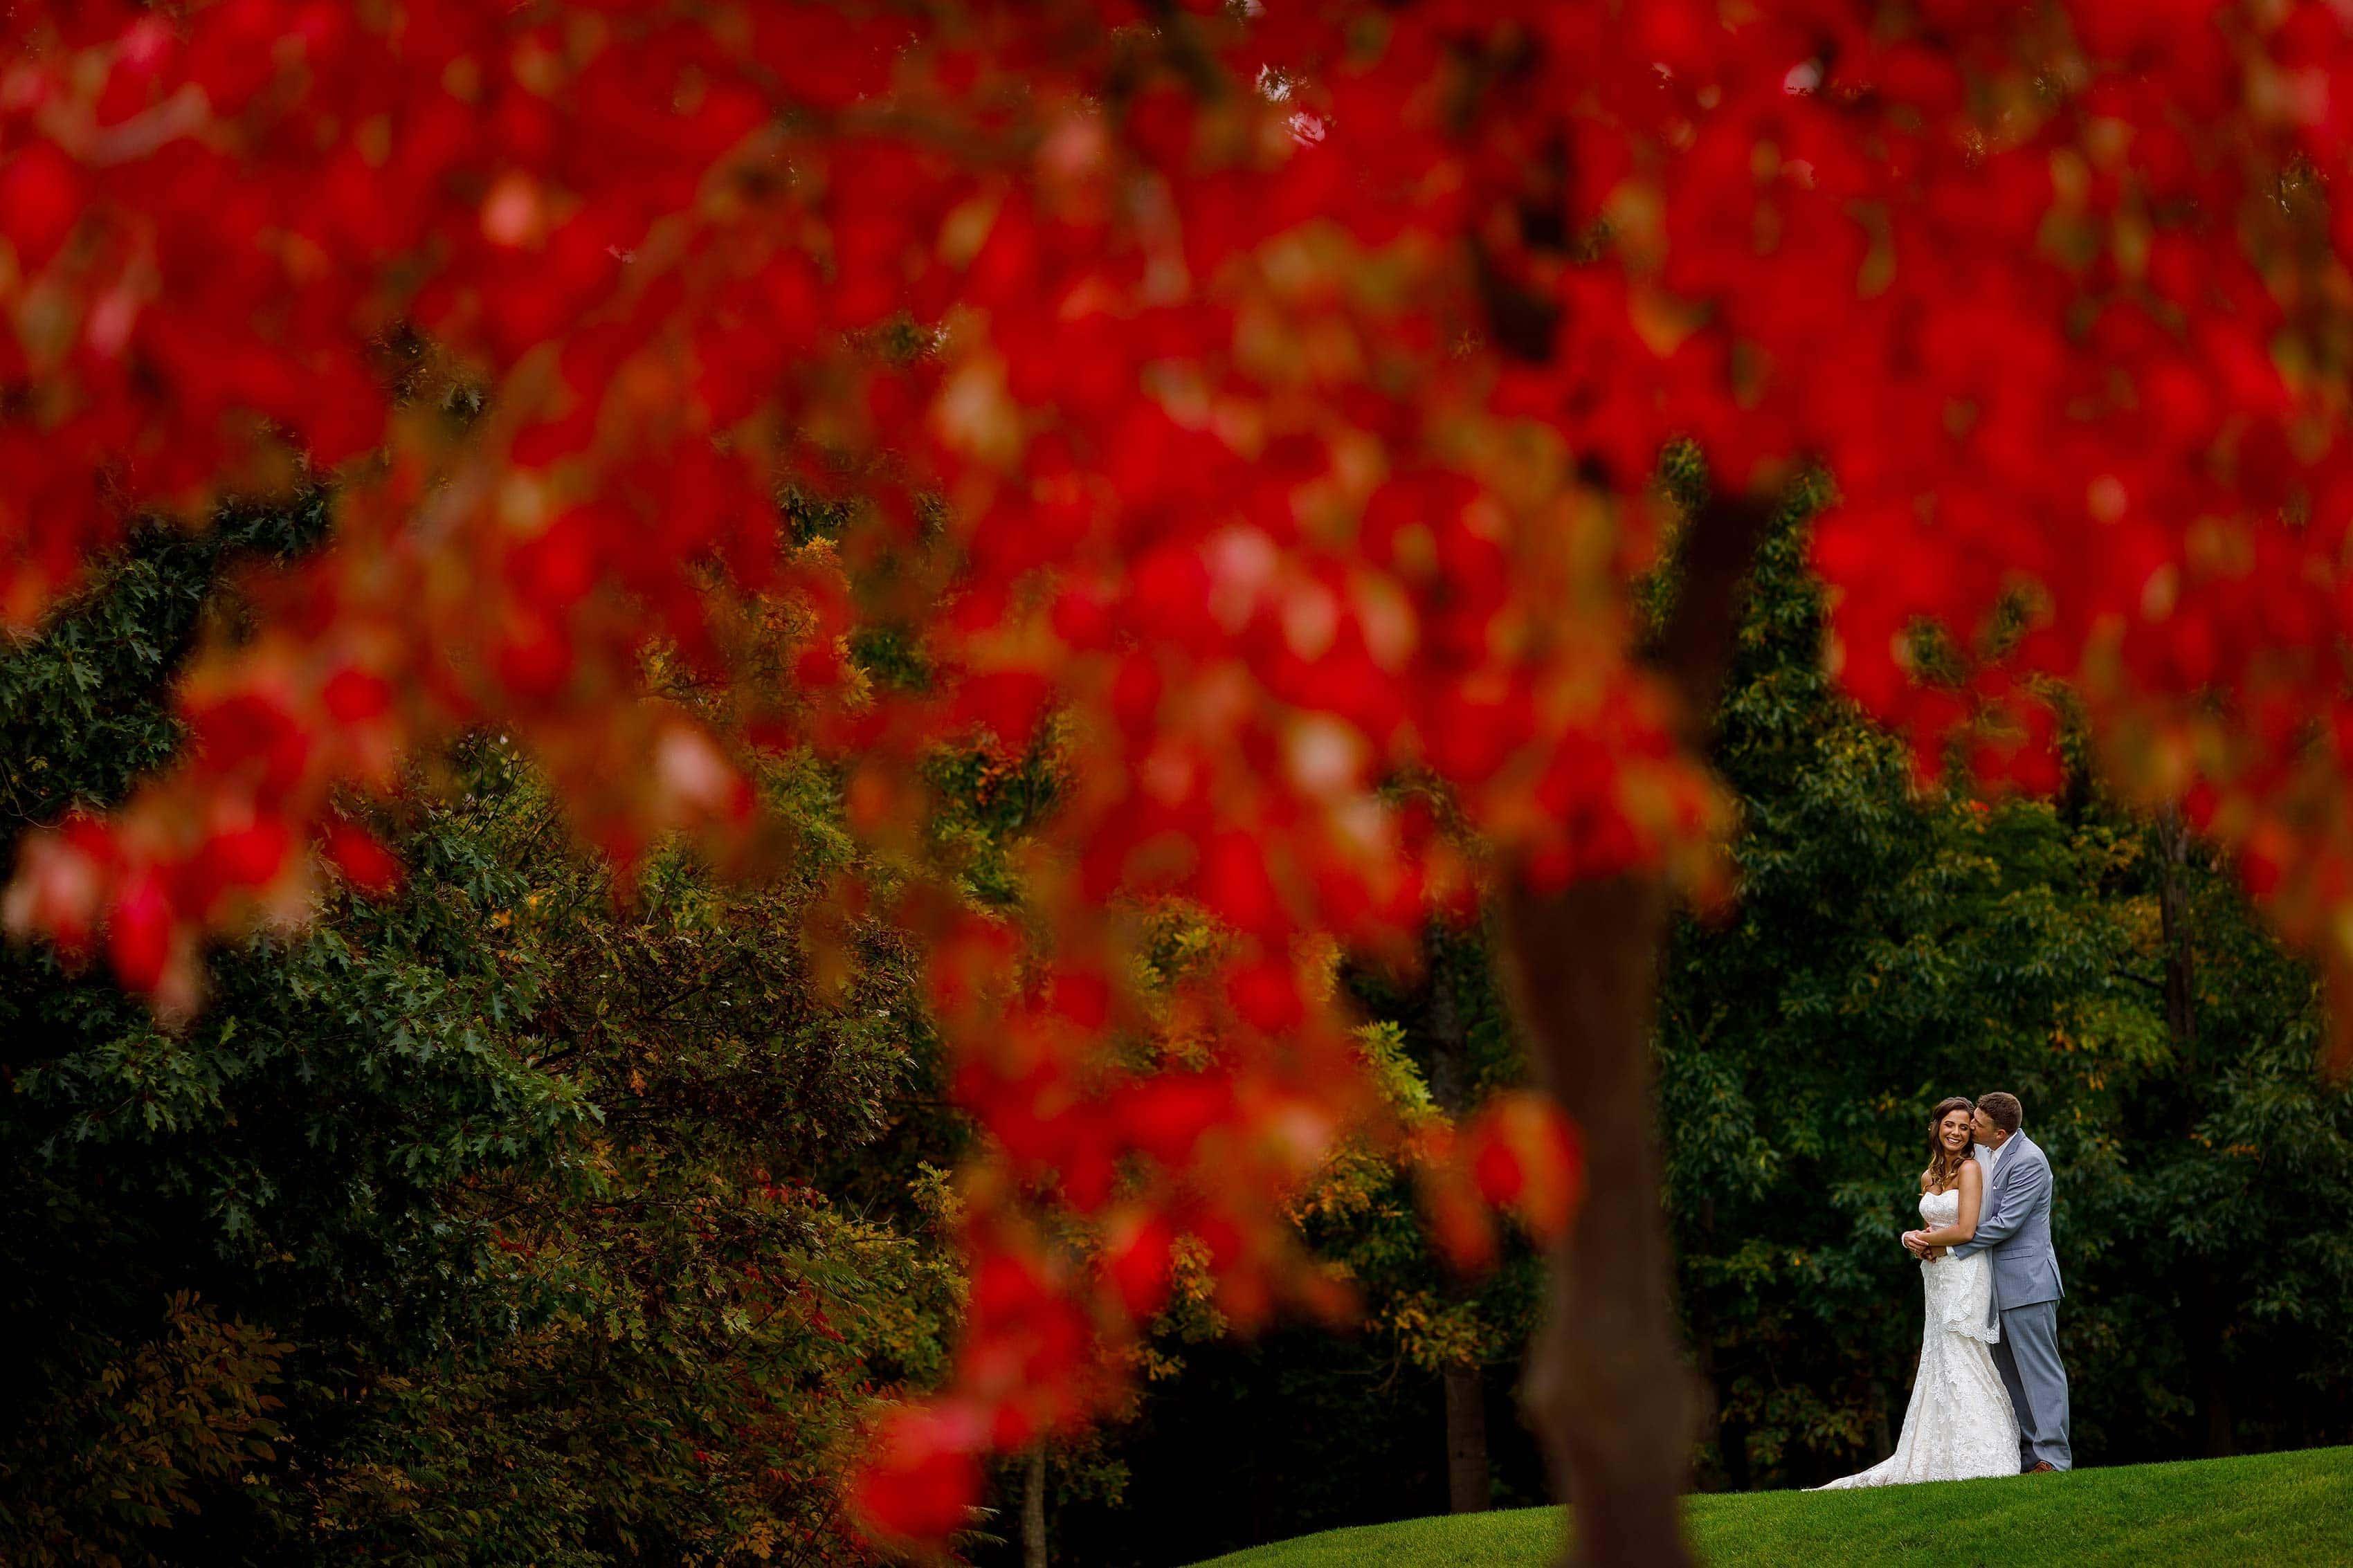 Marissa & Tory's Wedding at Buck's Run Golf Club